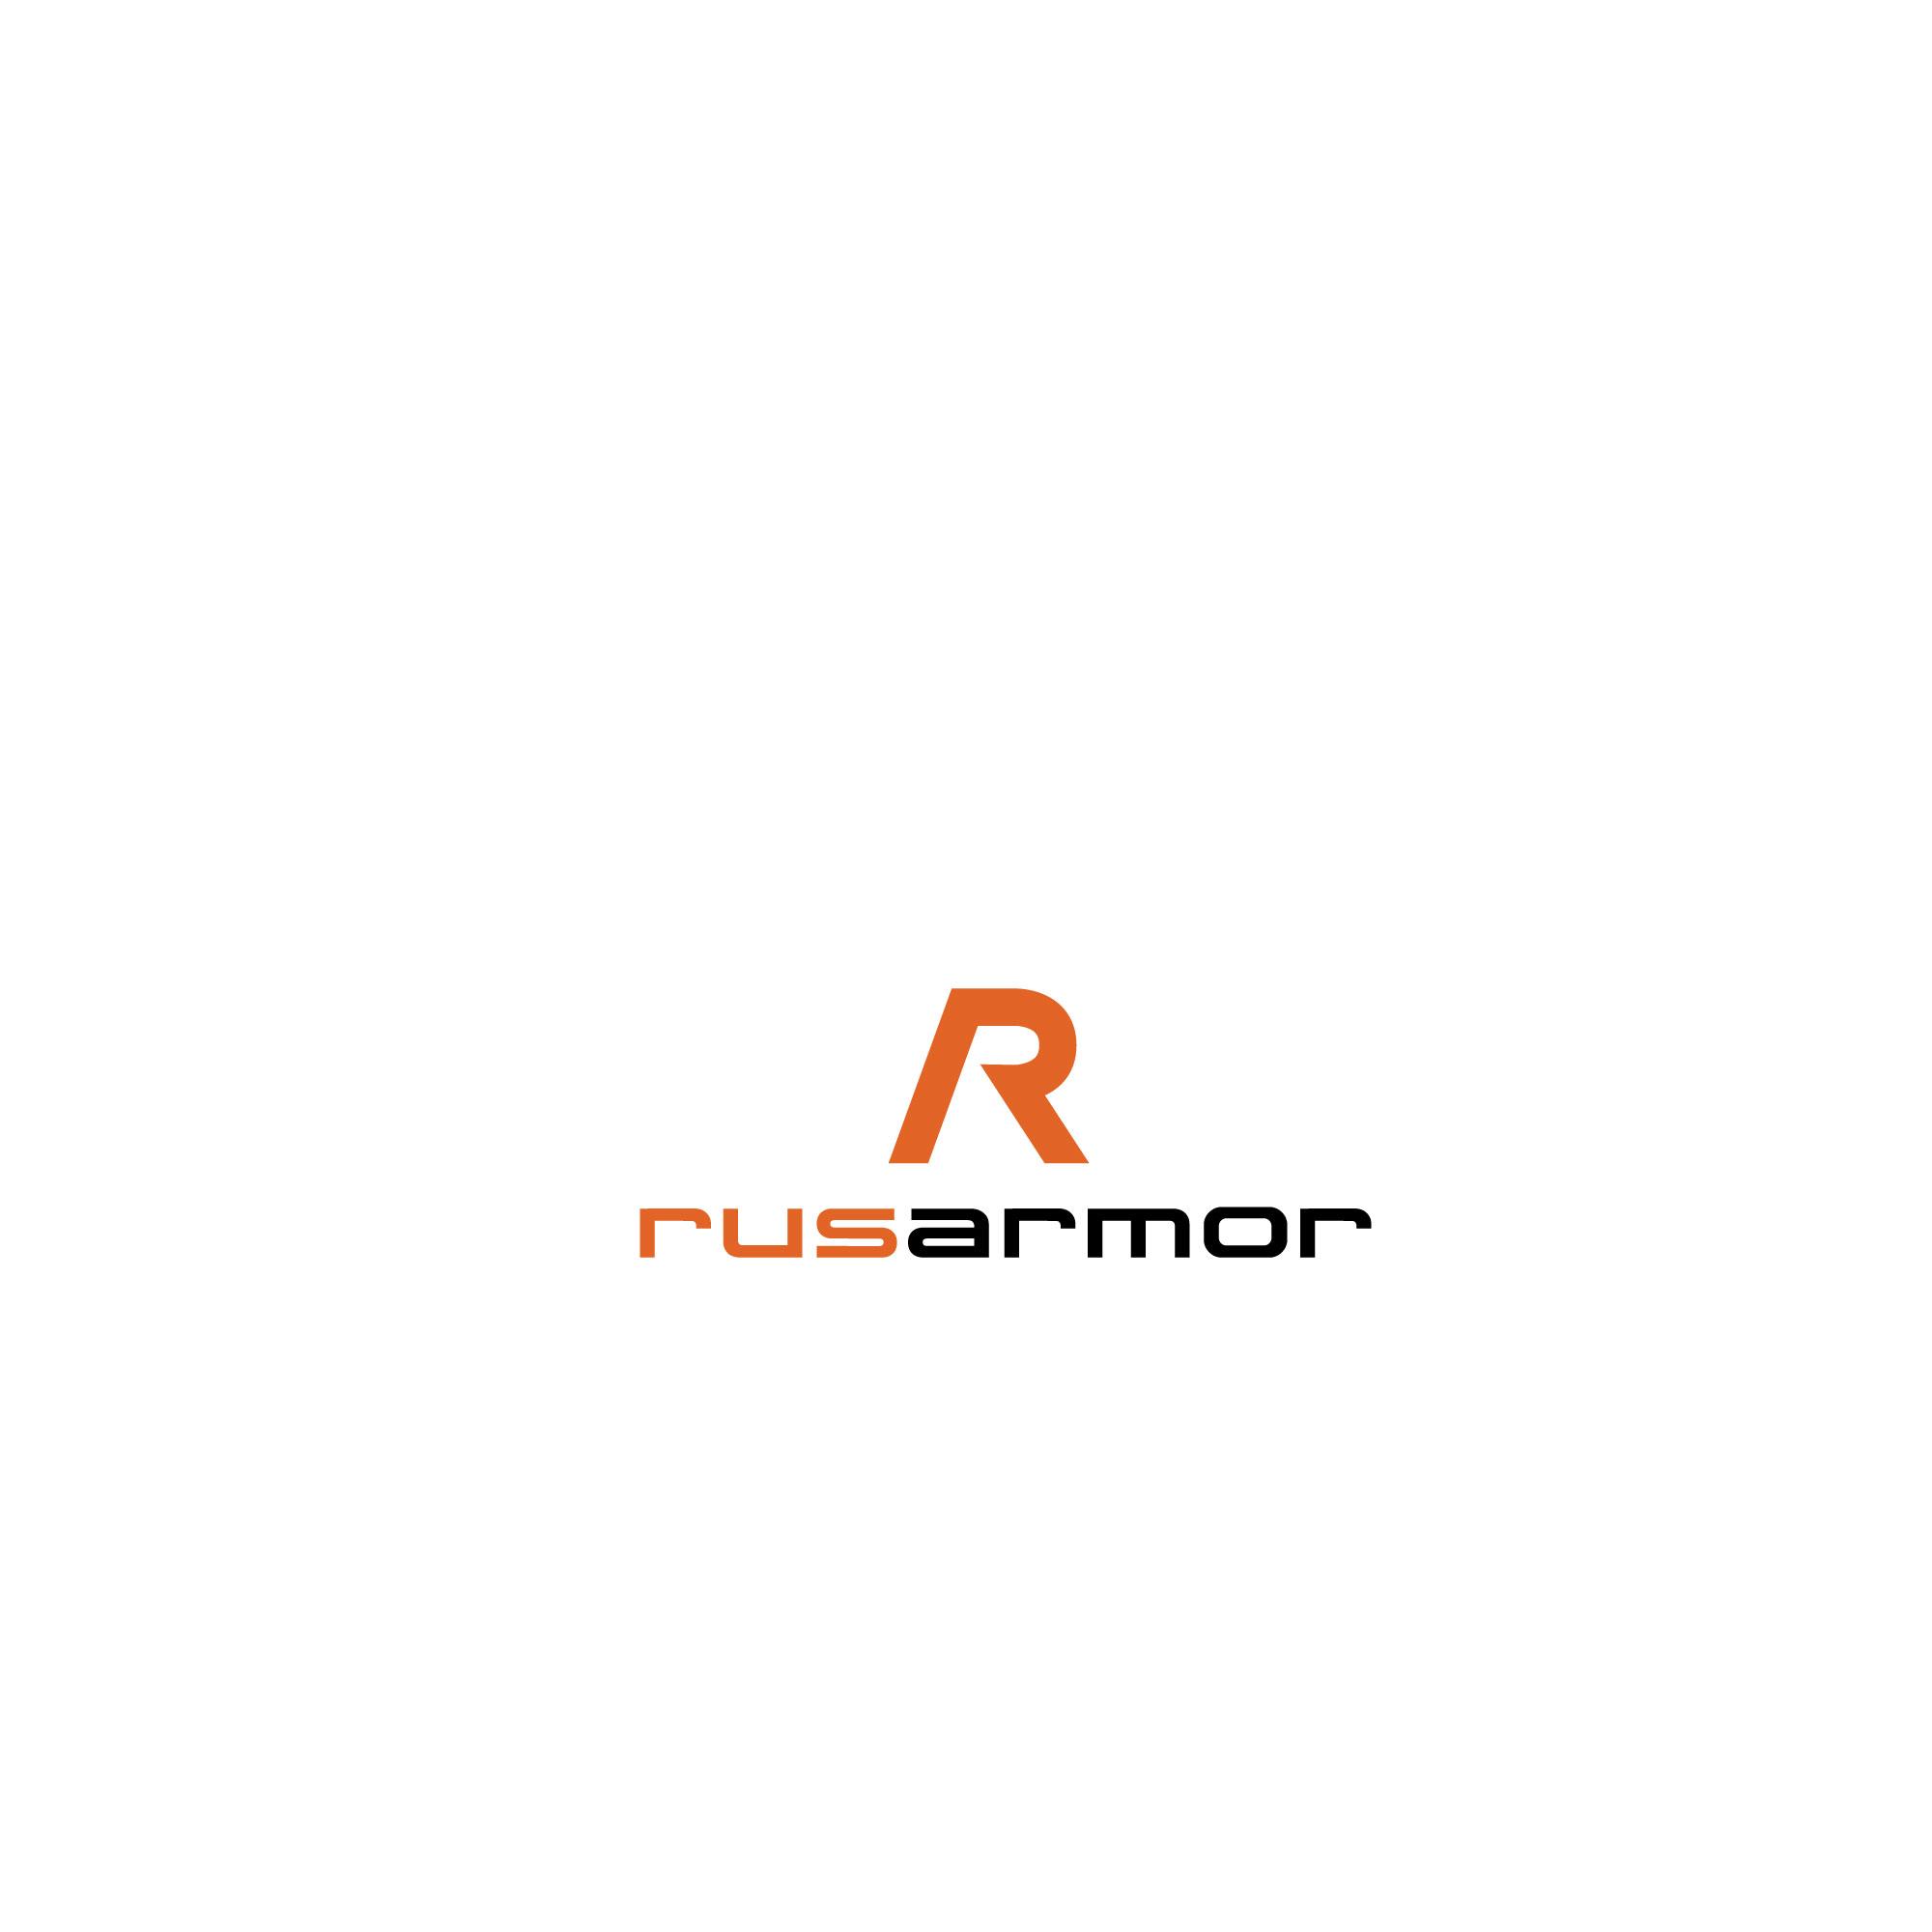 Разработка логотипа технологического стартапа РУСАРМОР фото f_1795a0aedda2488d.jpg